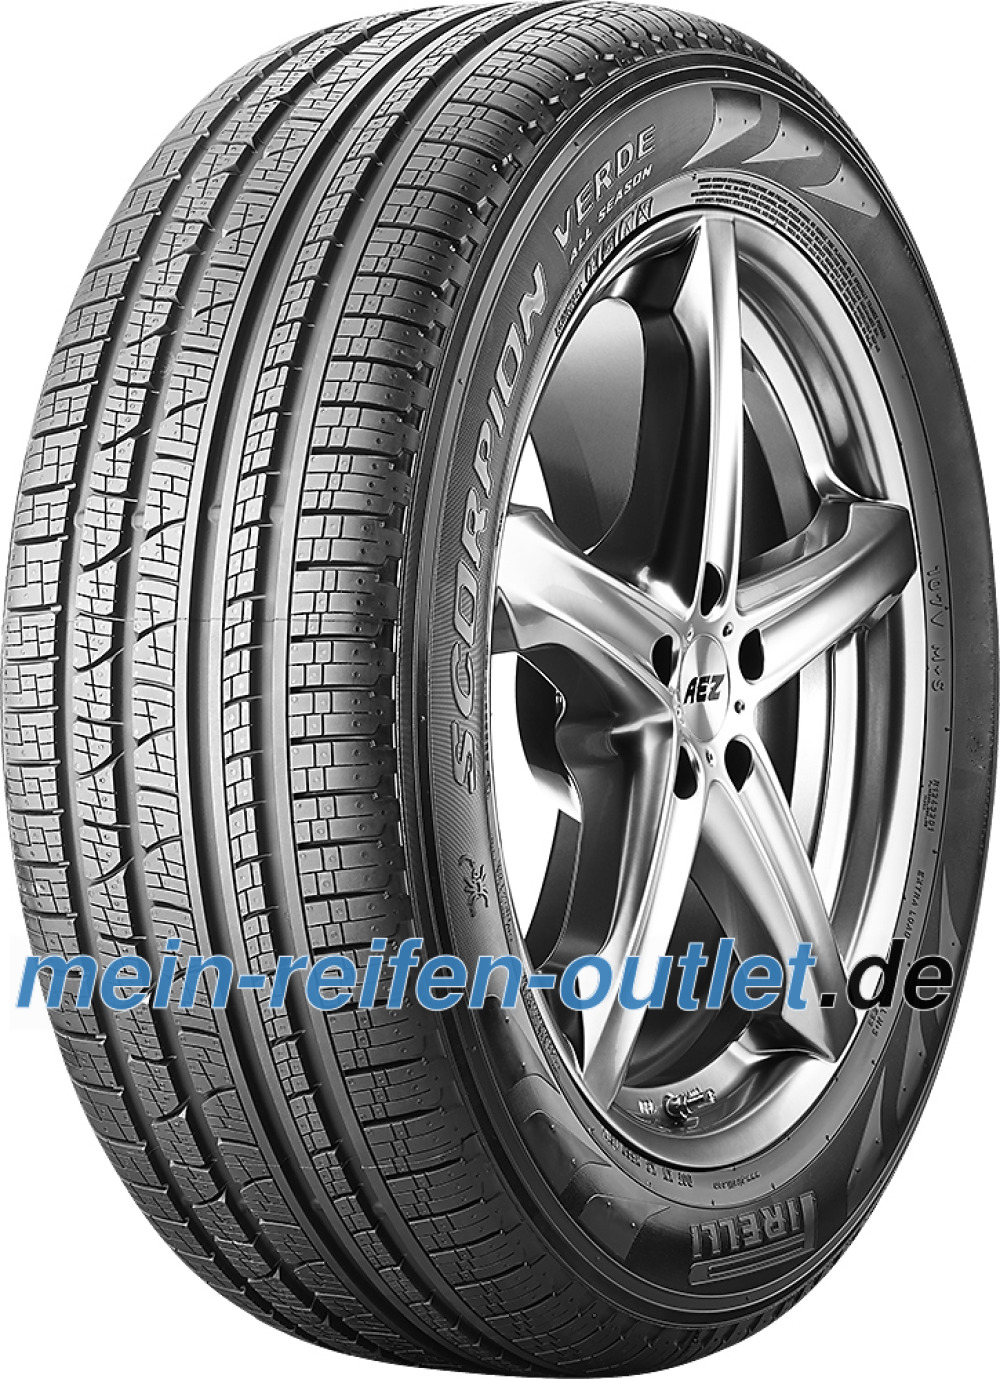 Pirelli Scorpion Verde All-Season ( 215/65 R17 99V ECOIMPACT, Seal Inside, mit Felgenschutz (MFS) )